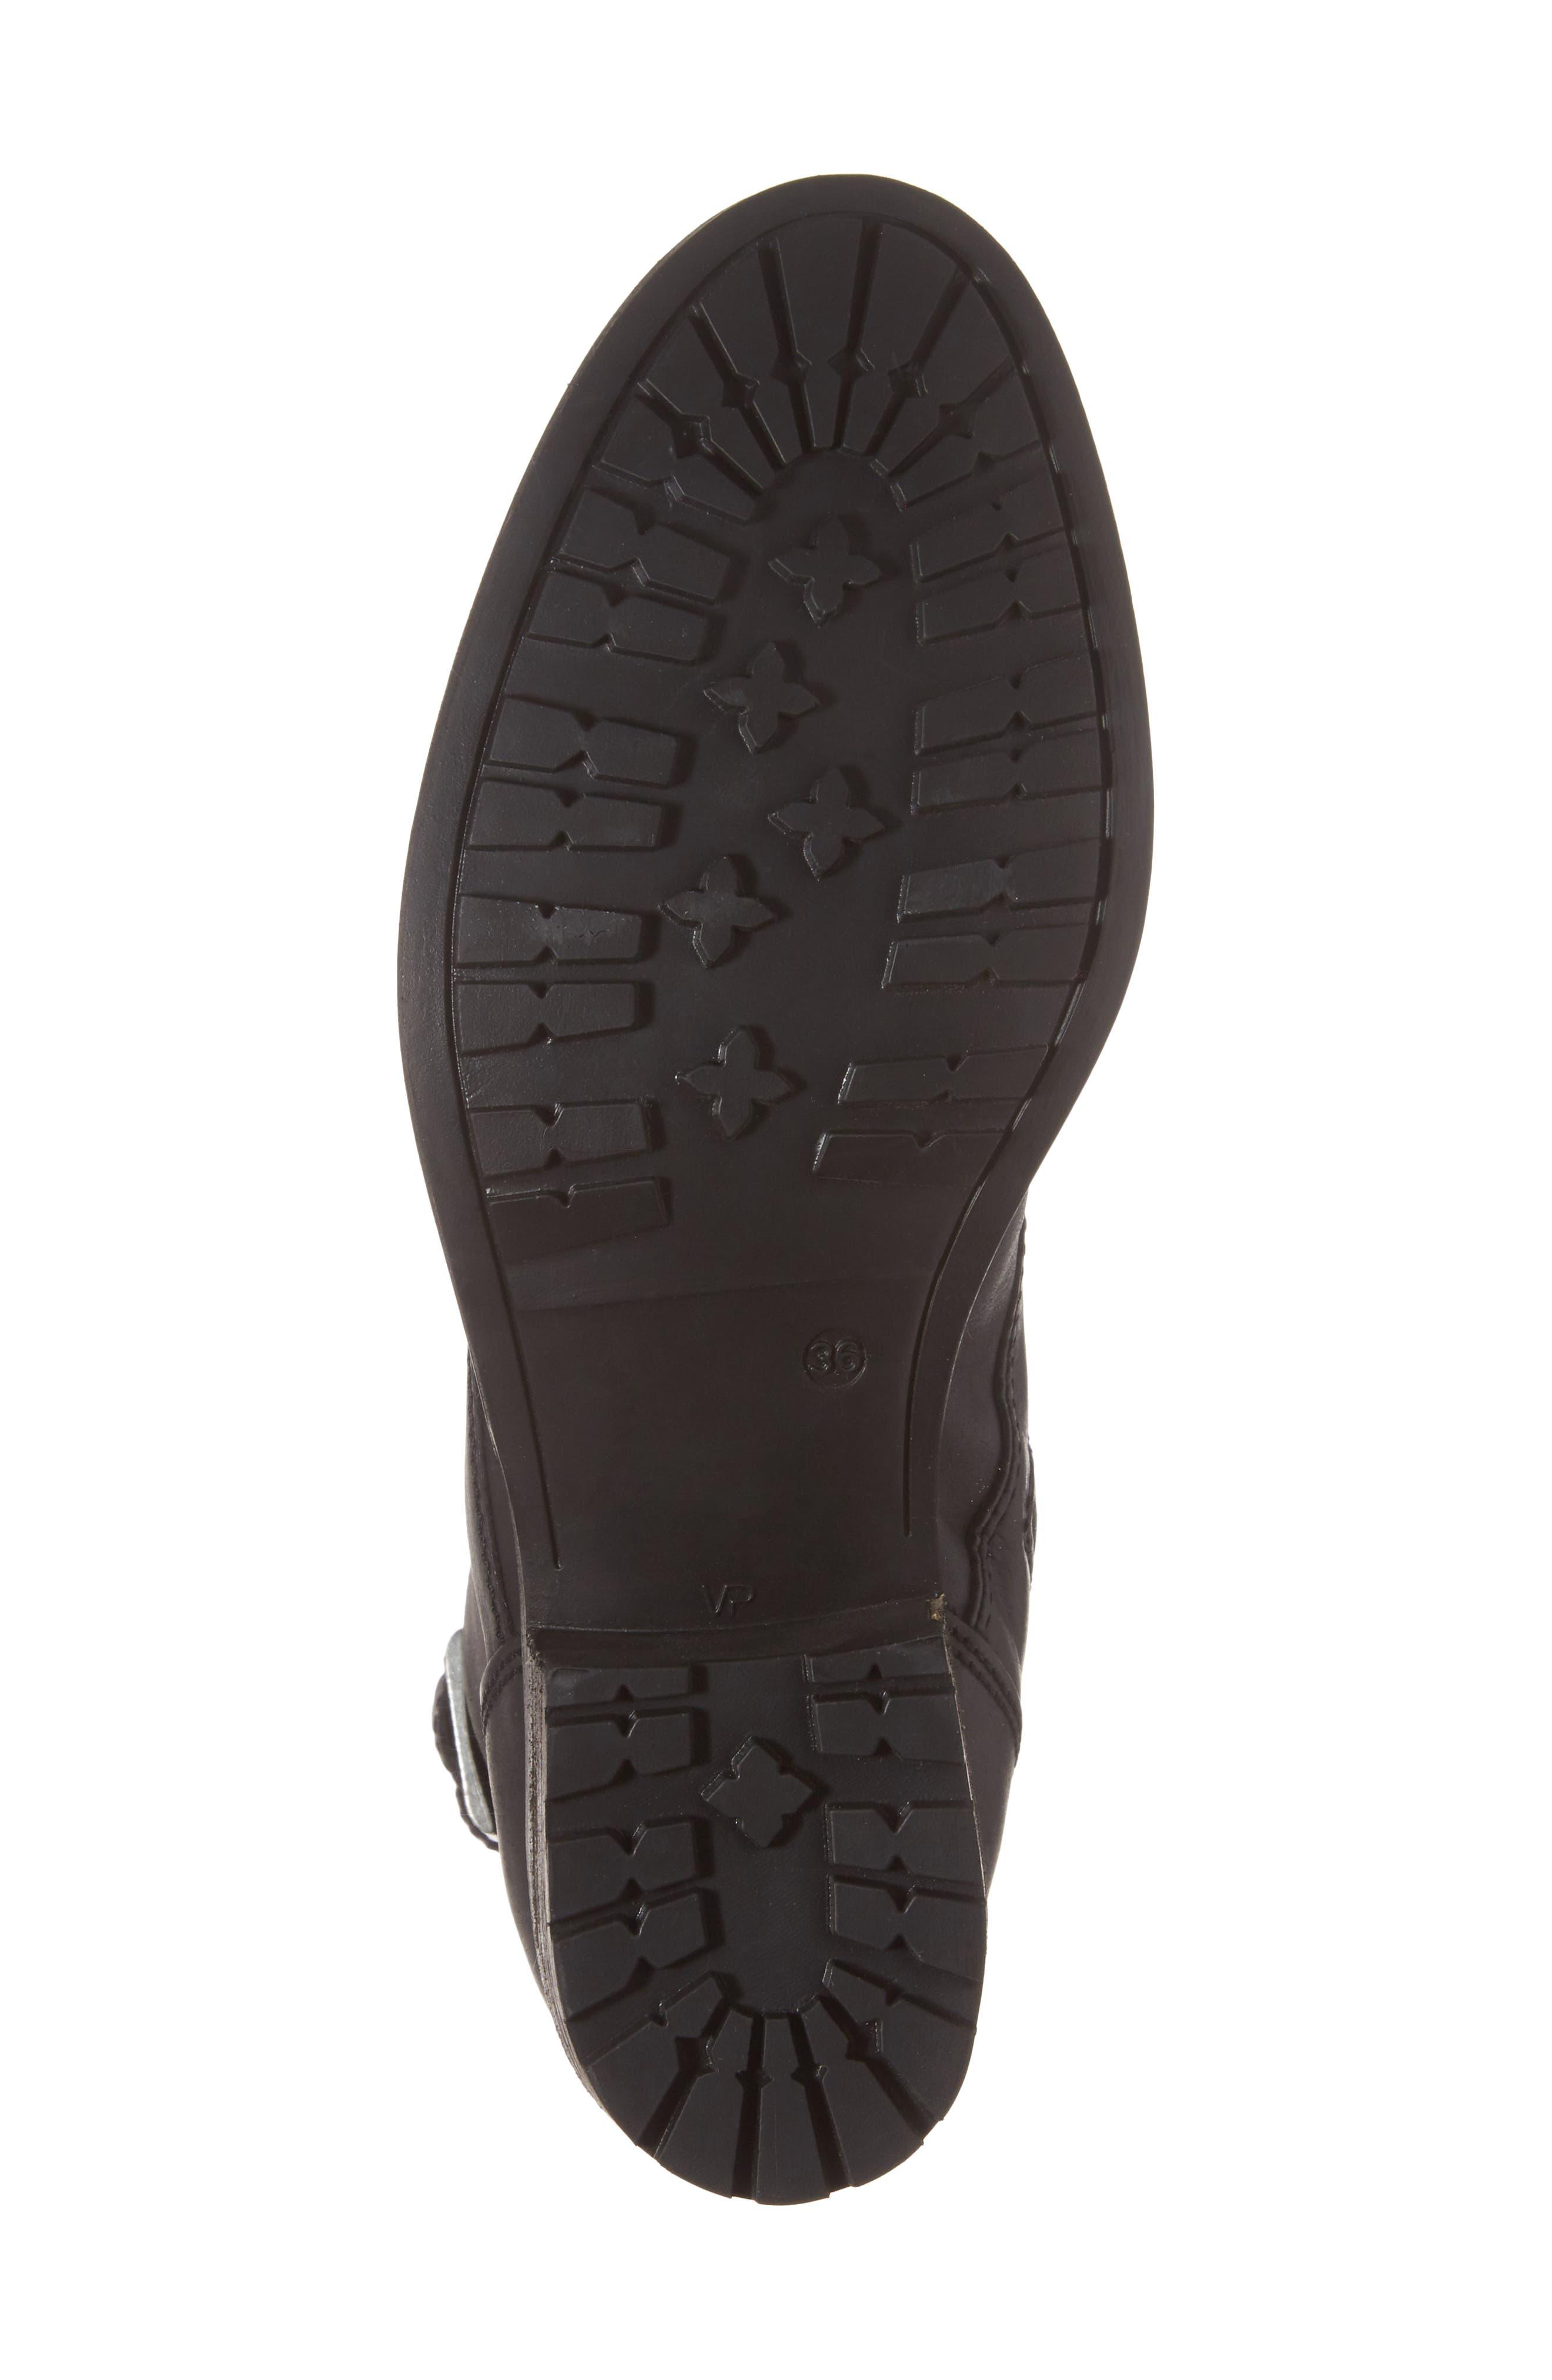 Lune Waterproof Moto Boot,                             Alternate thumbnail 6, color,                             Black Varese Leather